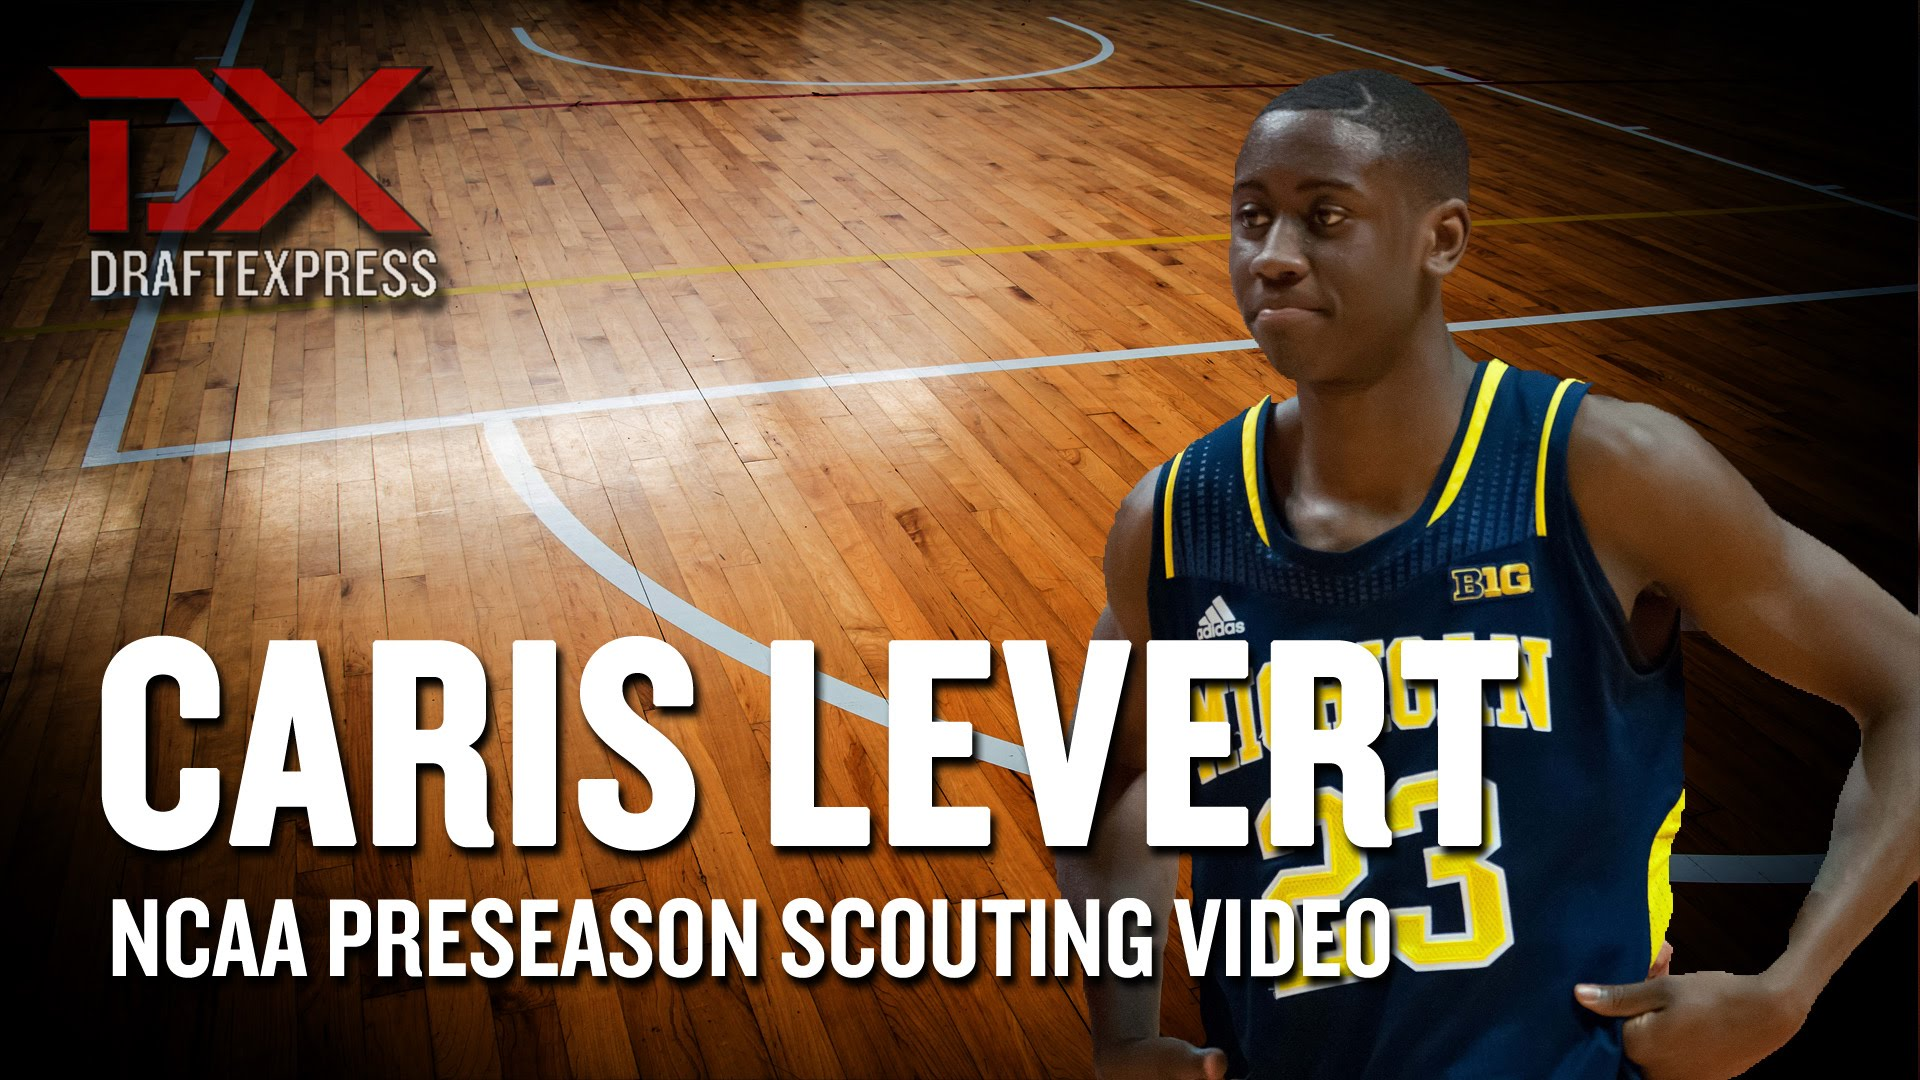 Caris LeVert 2014-15 Preseason Scouting Video